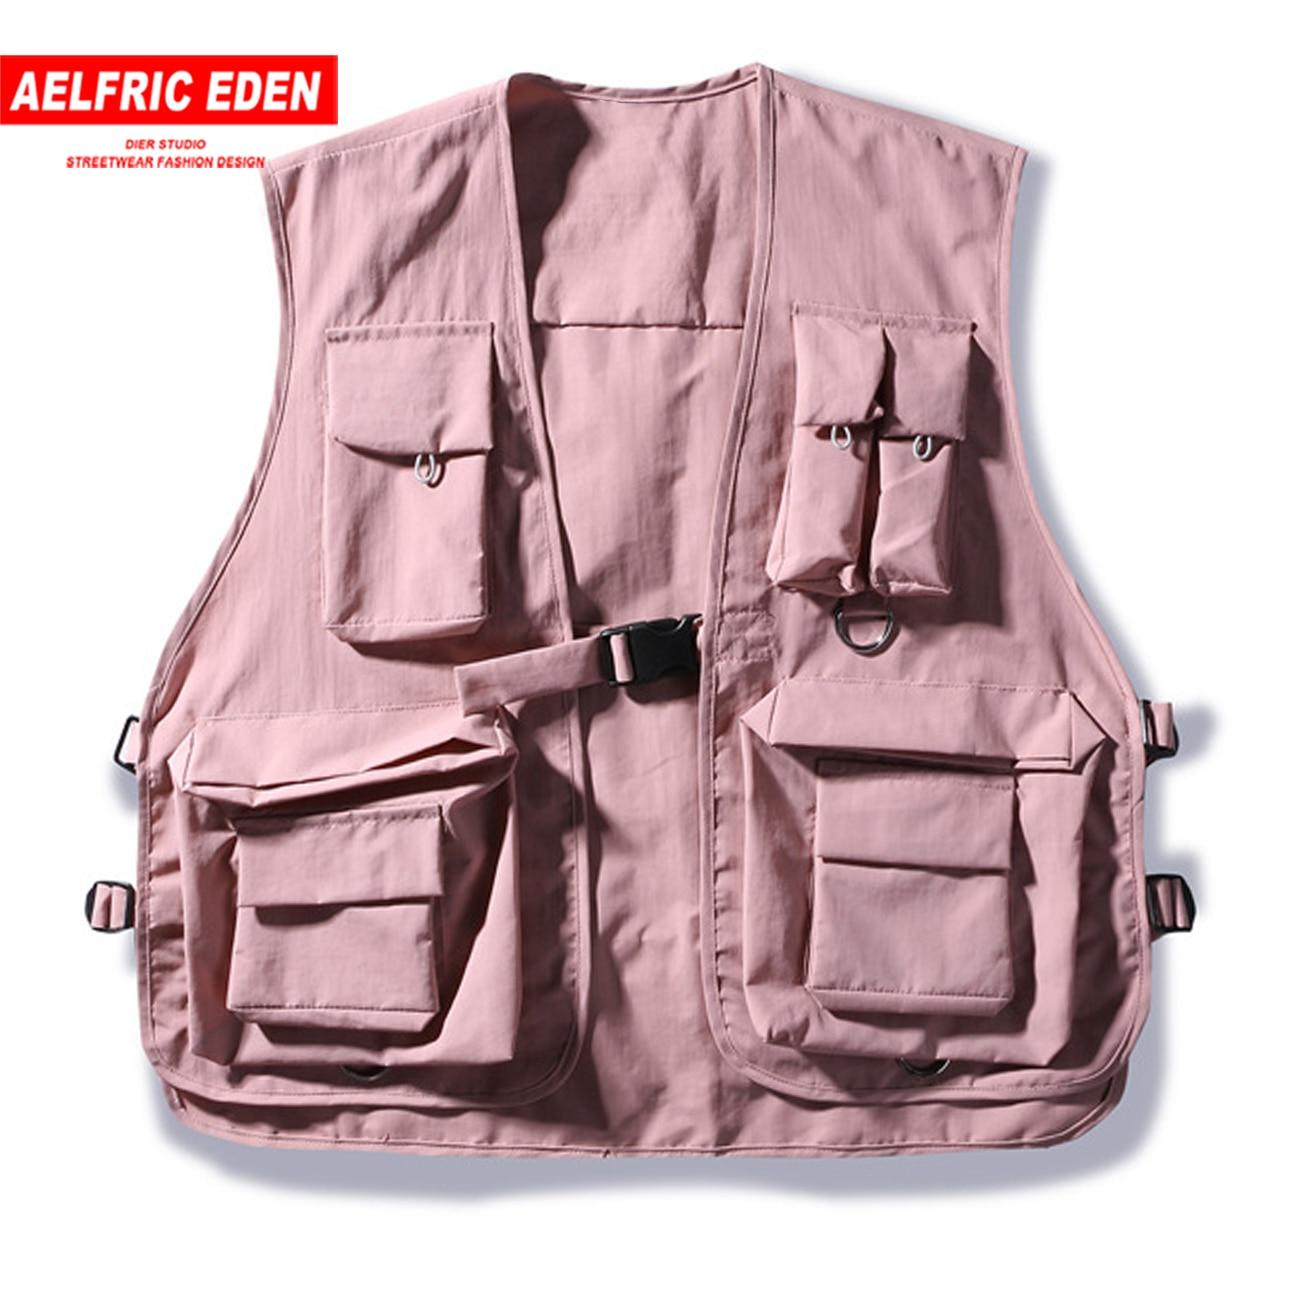 Aelfric Eden Hip Hop Cargo Vests Men 2020 Patchwork Tactical Overalls Fashion Sleeveless Multi Pockets Vintage Coats Streetwear